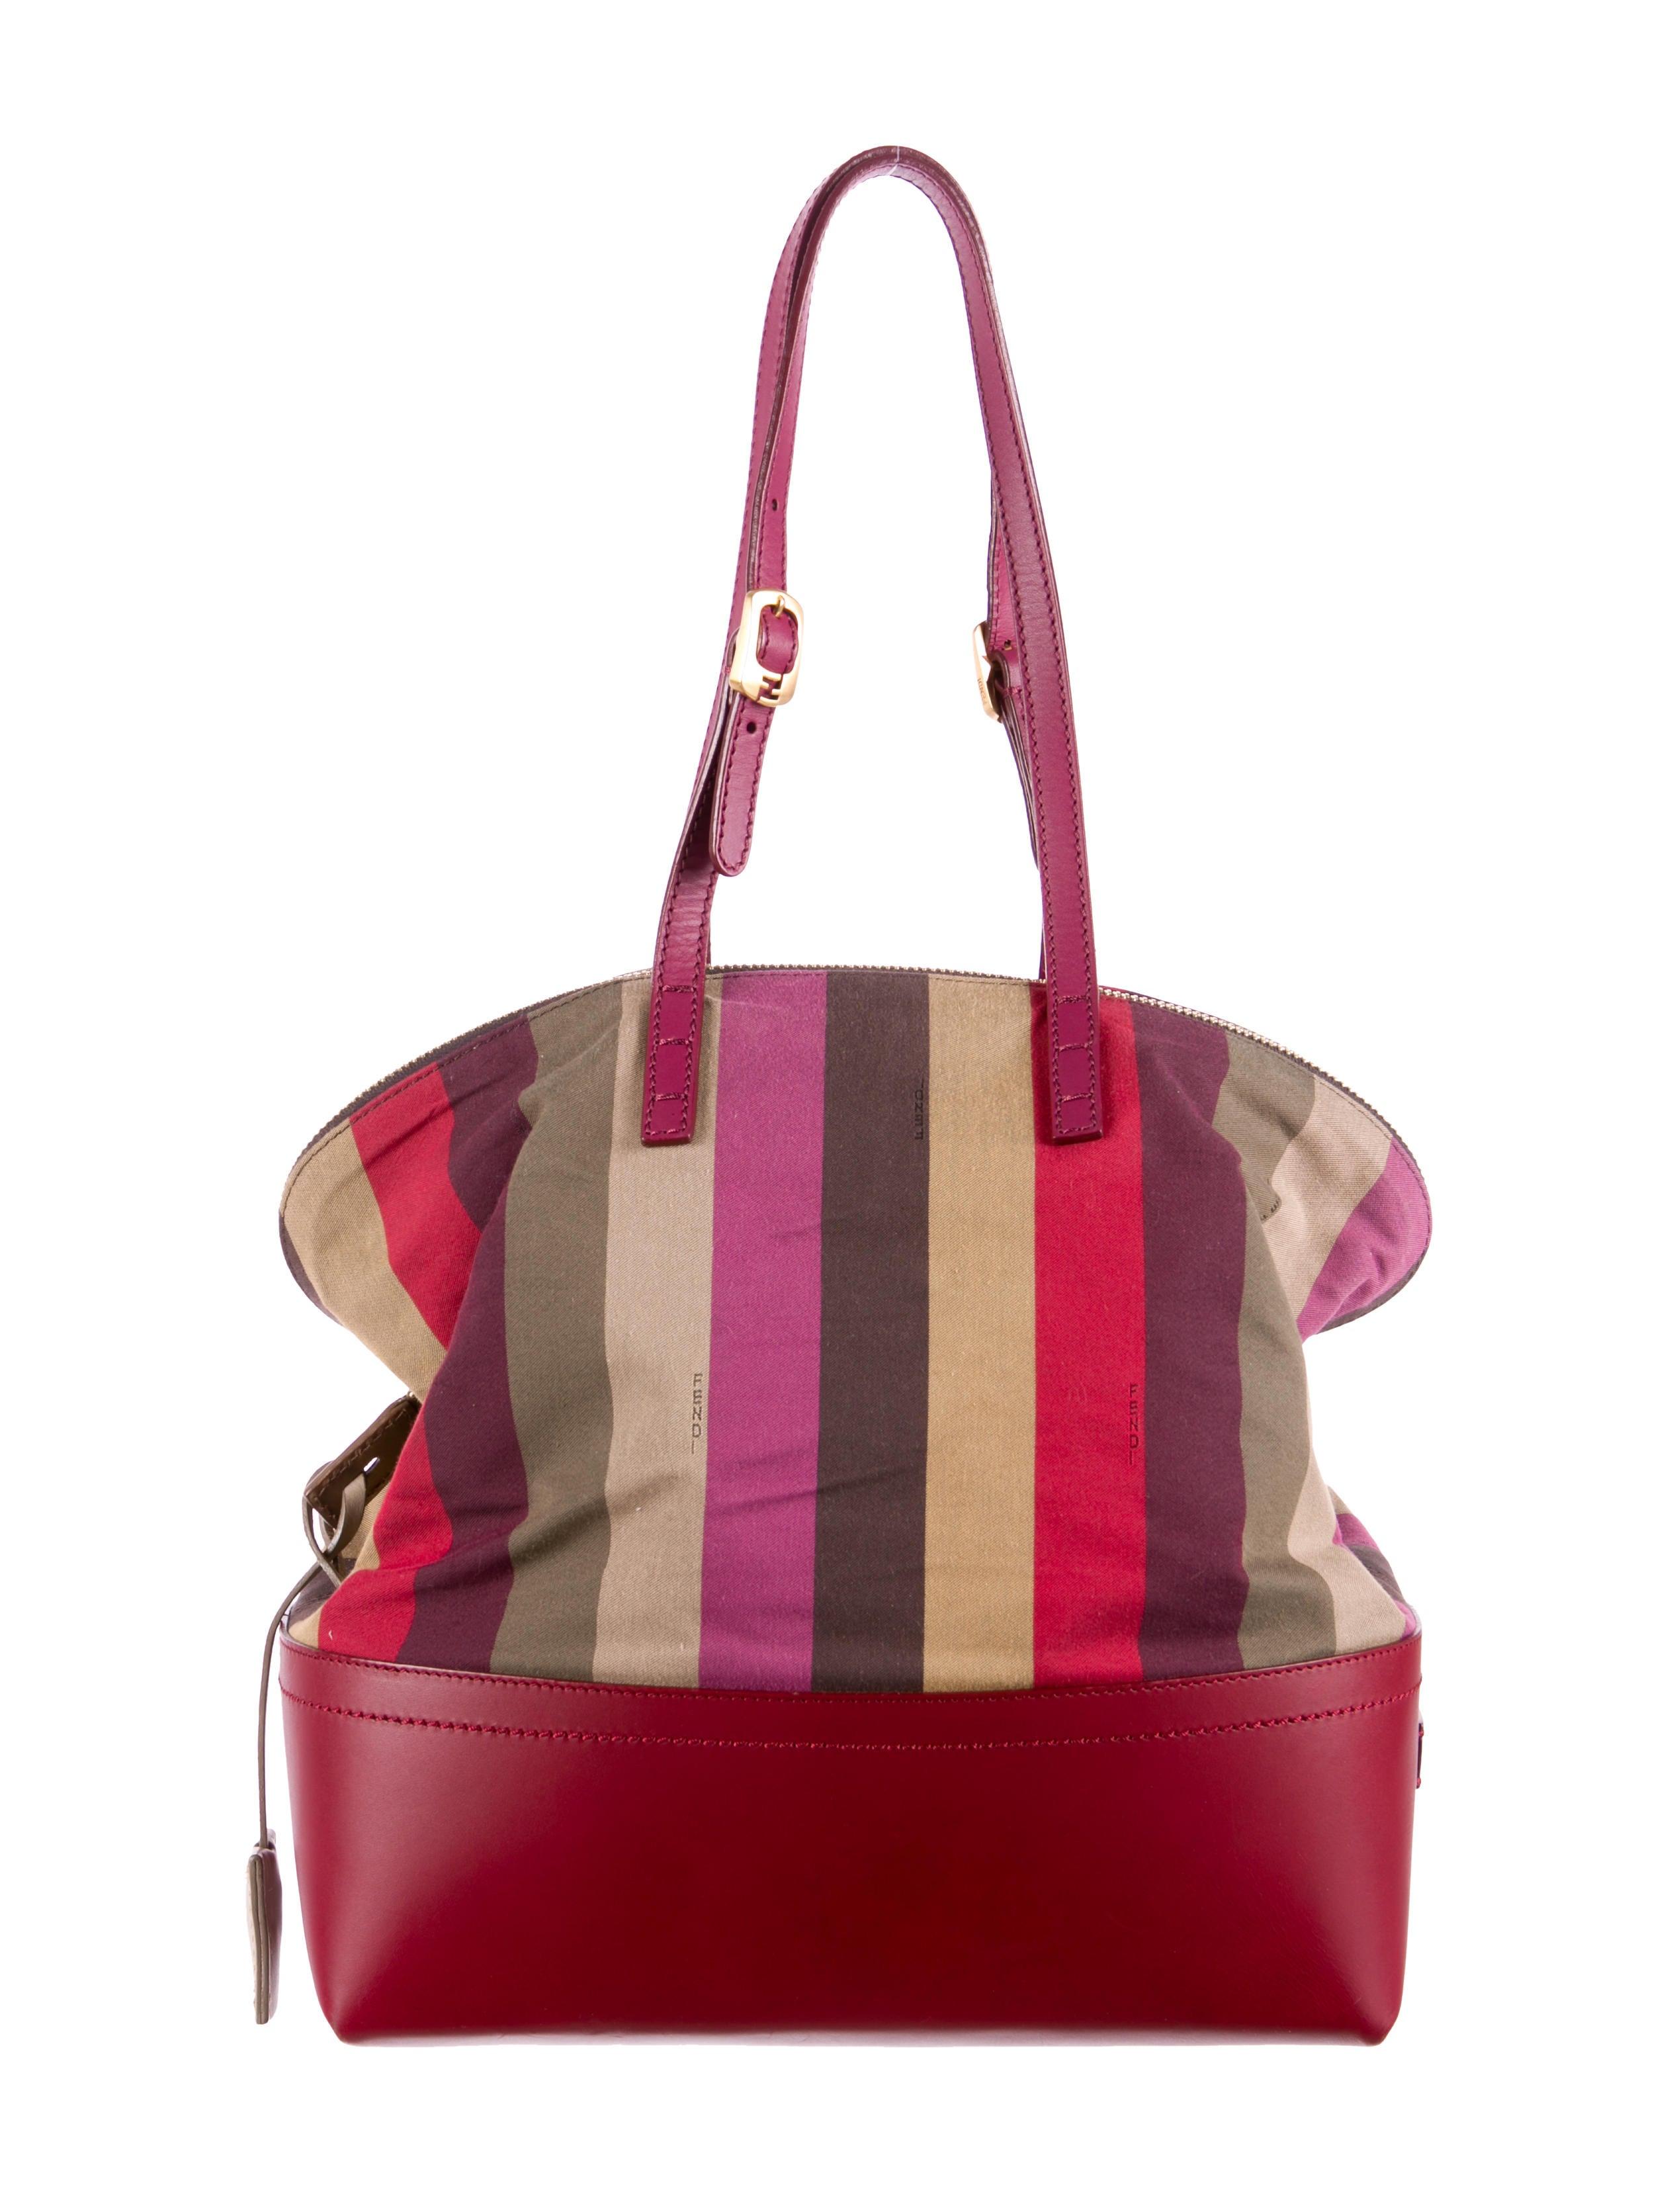 d8780d9e8203 ... coupon code for fendi penguin 2bag handbags fen35919 the realreal db751  9b02e